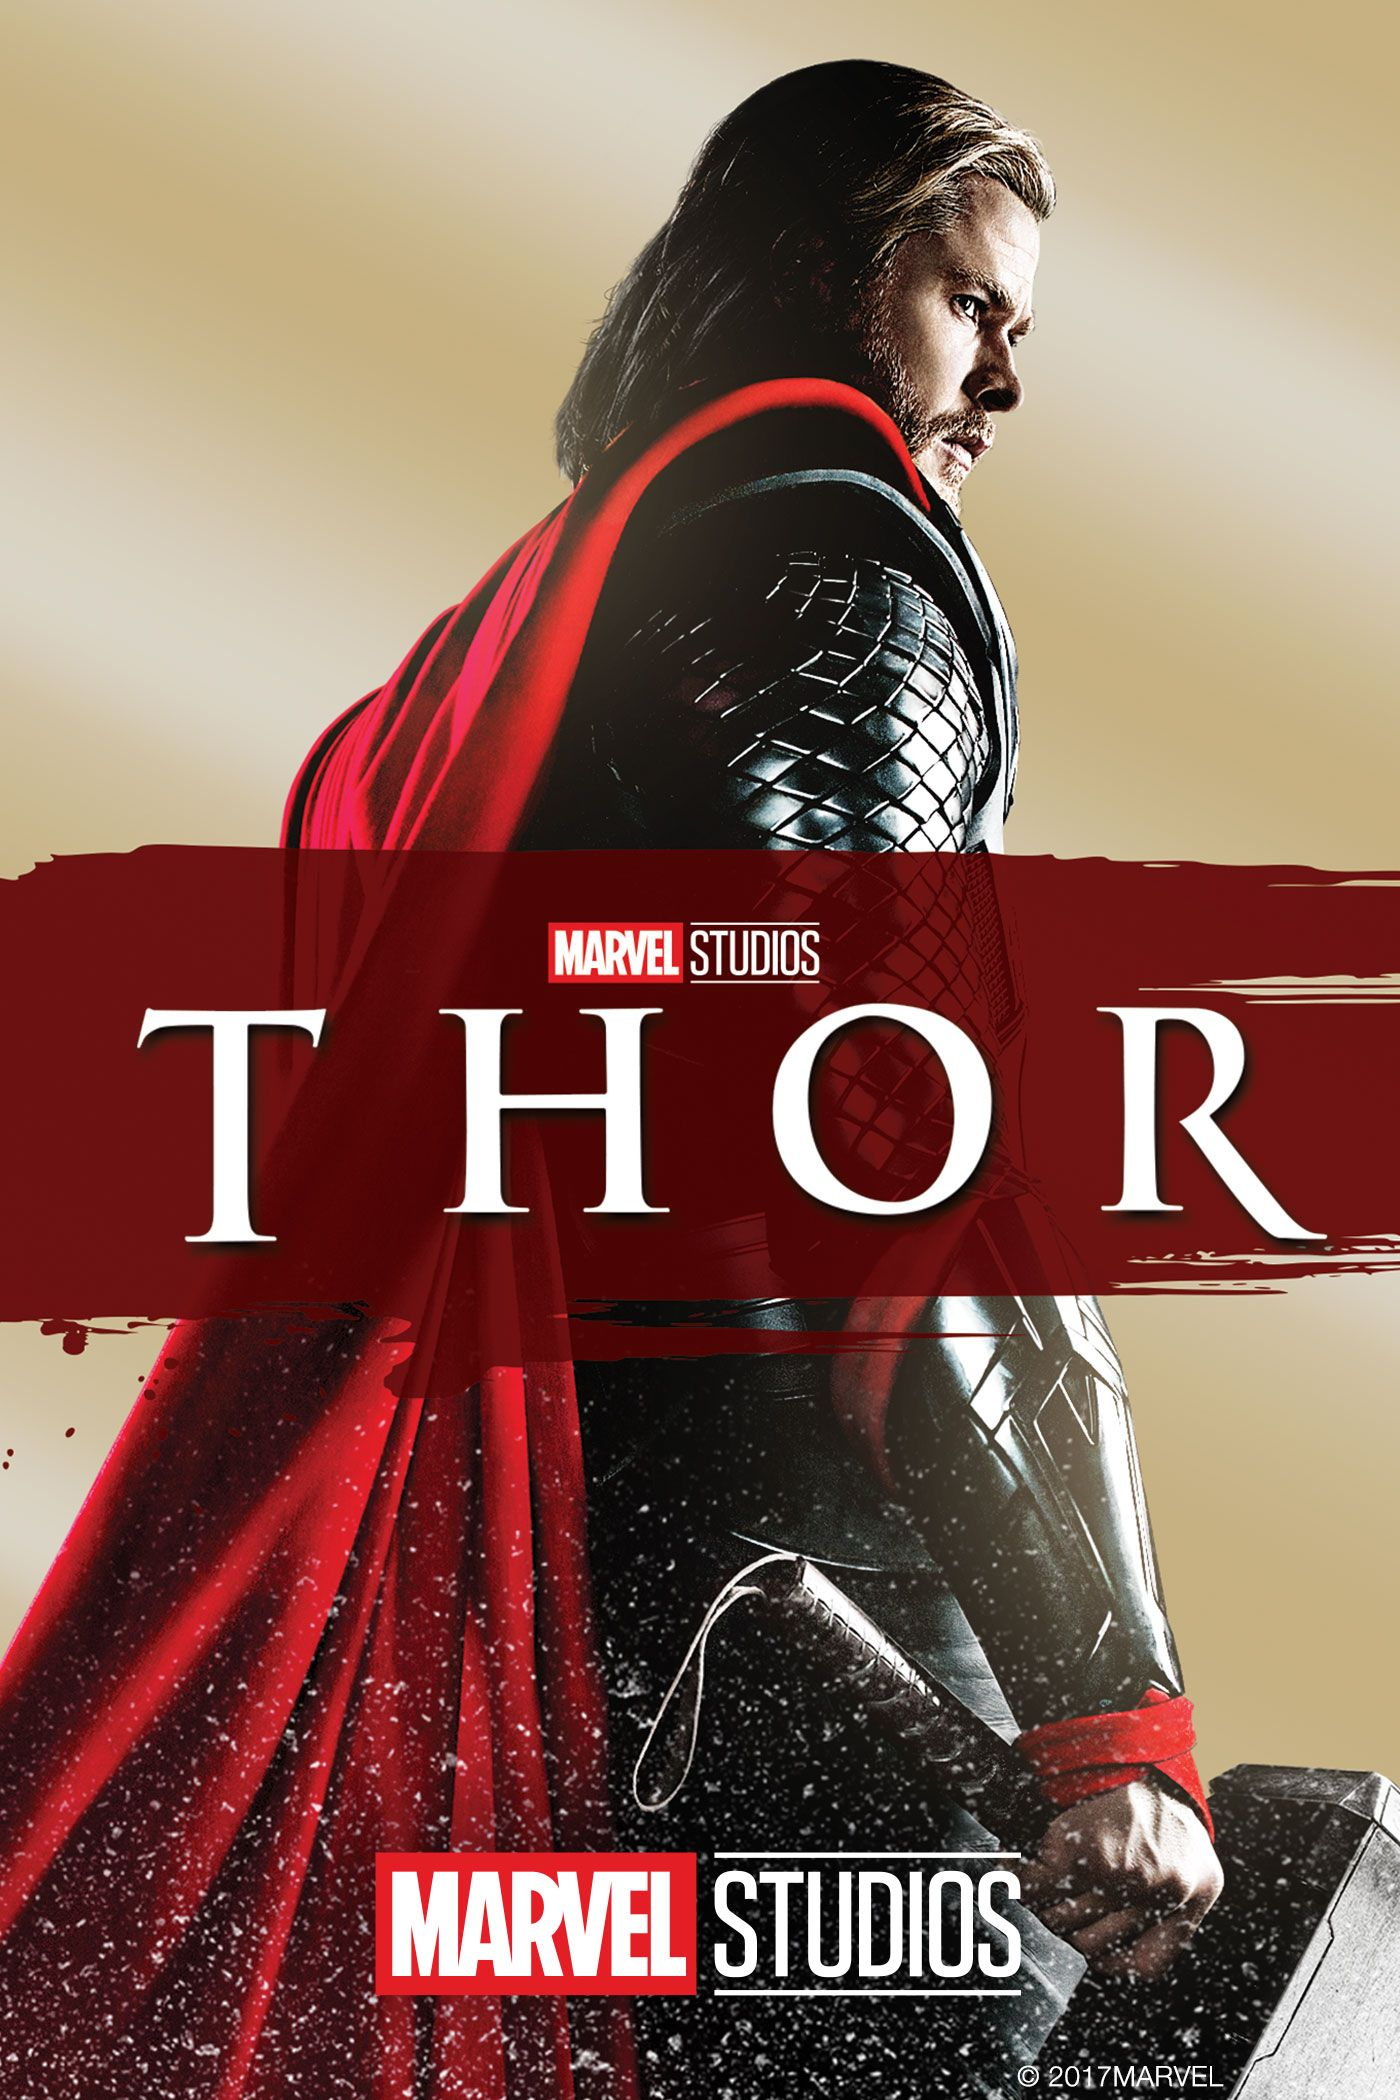 Marvel Studios Thor Full Movie Movies Anywhere